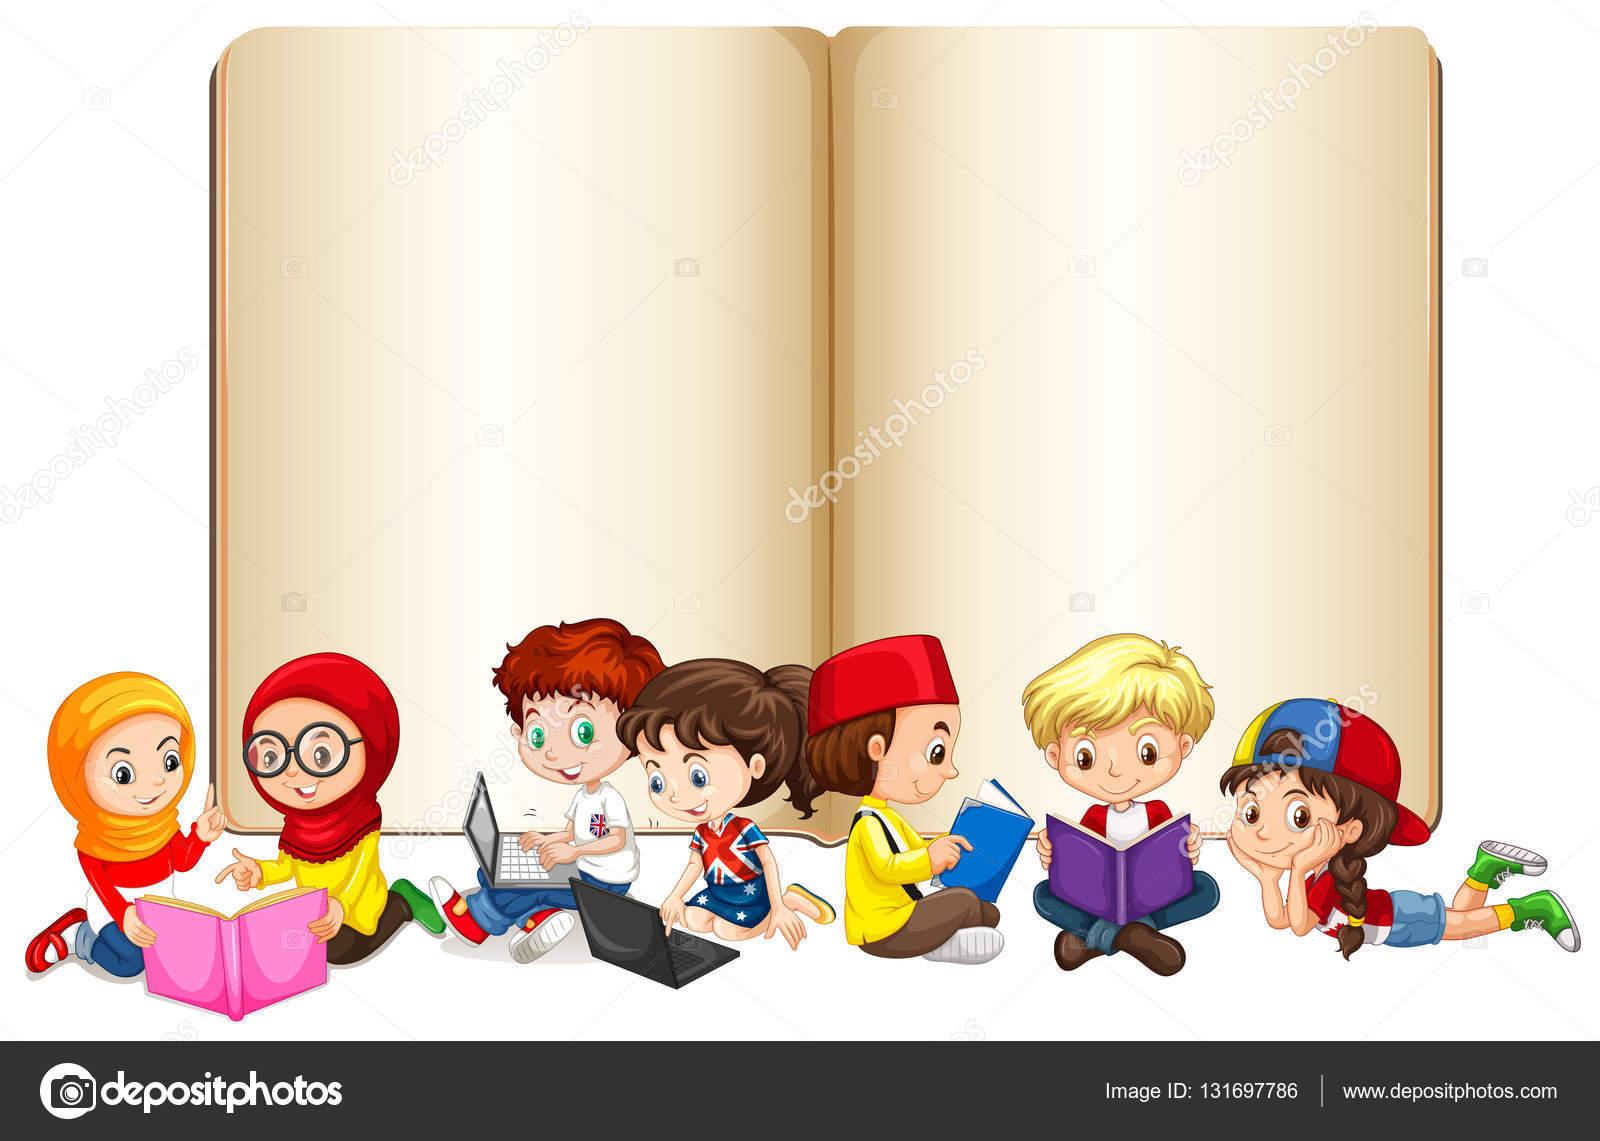 Portadas De Libros De Niños En Español